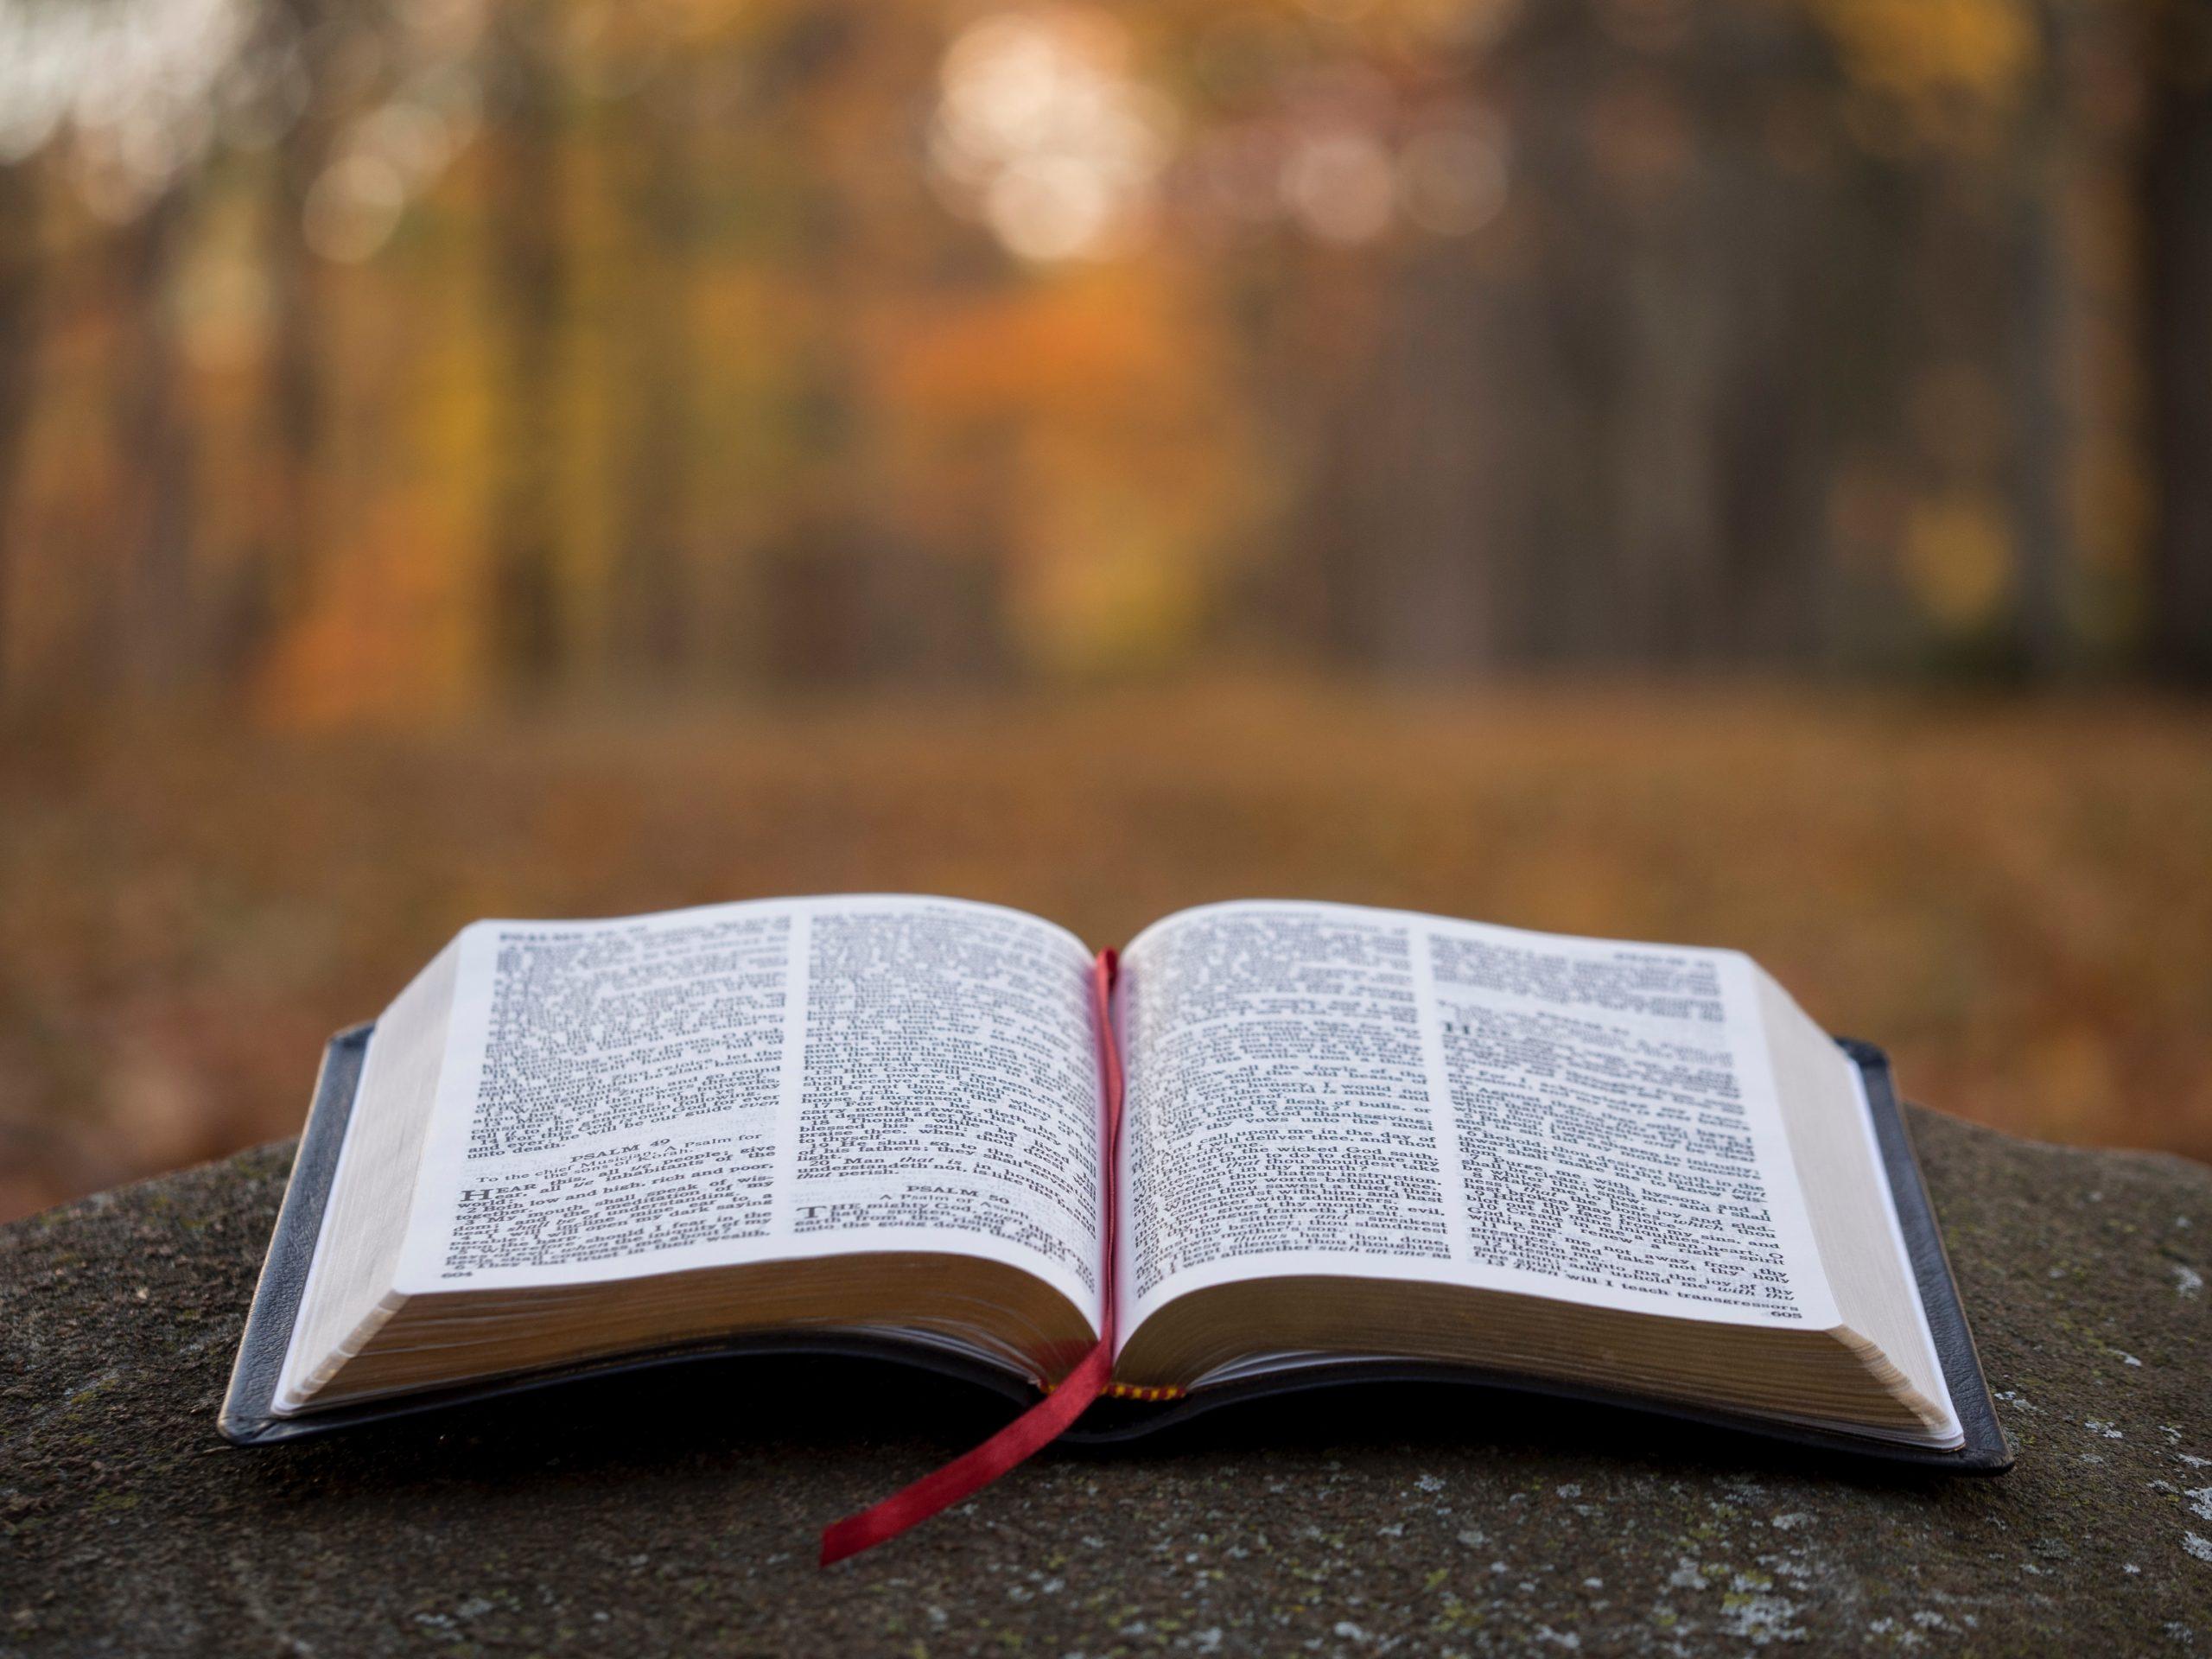 Lire la bible chez soi